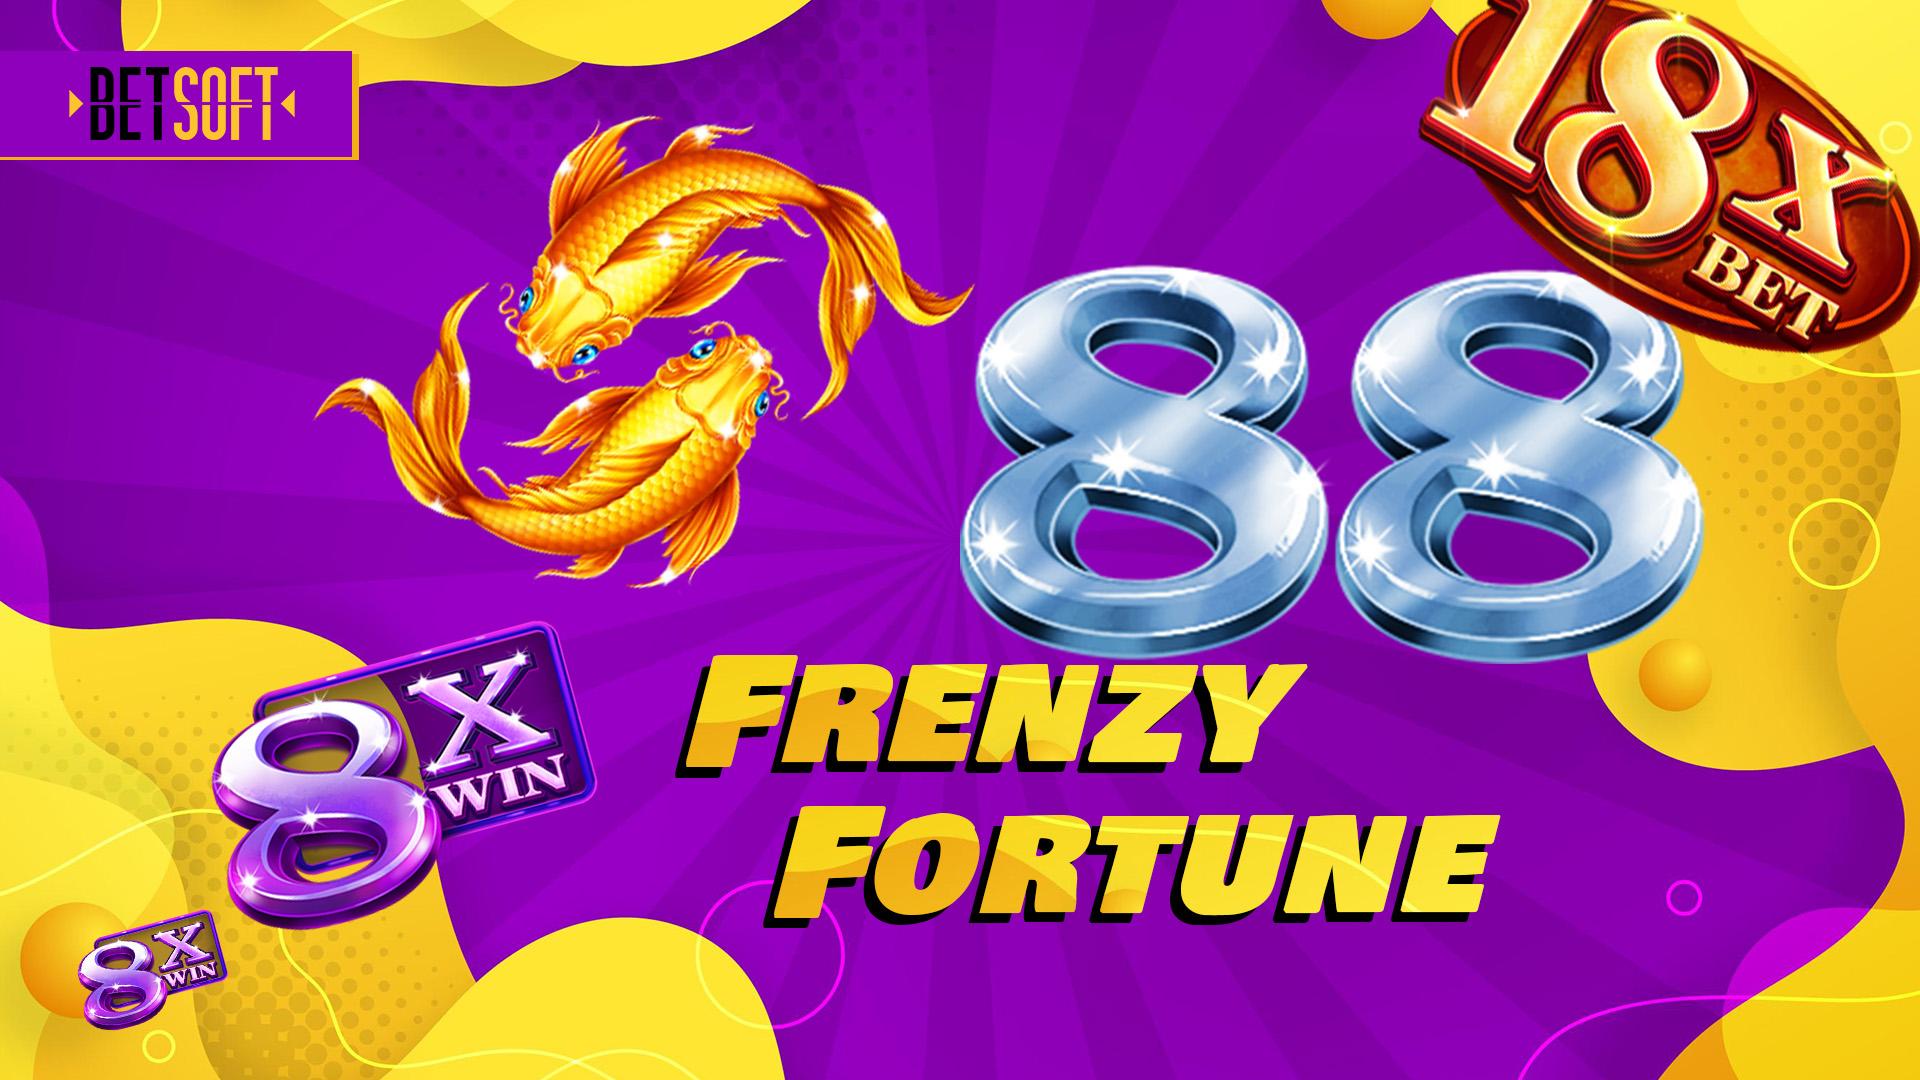 88-frenzy-fortune-slot